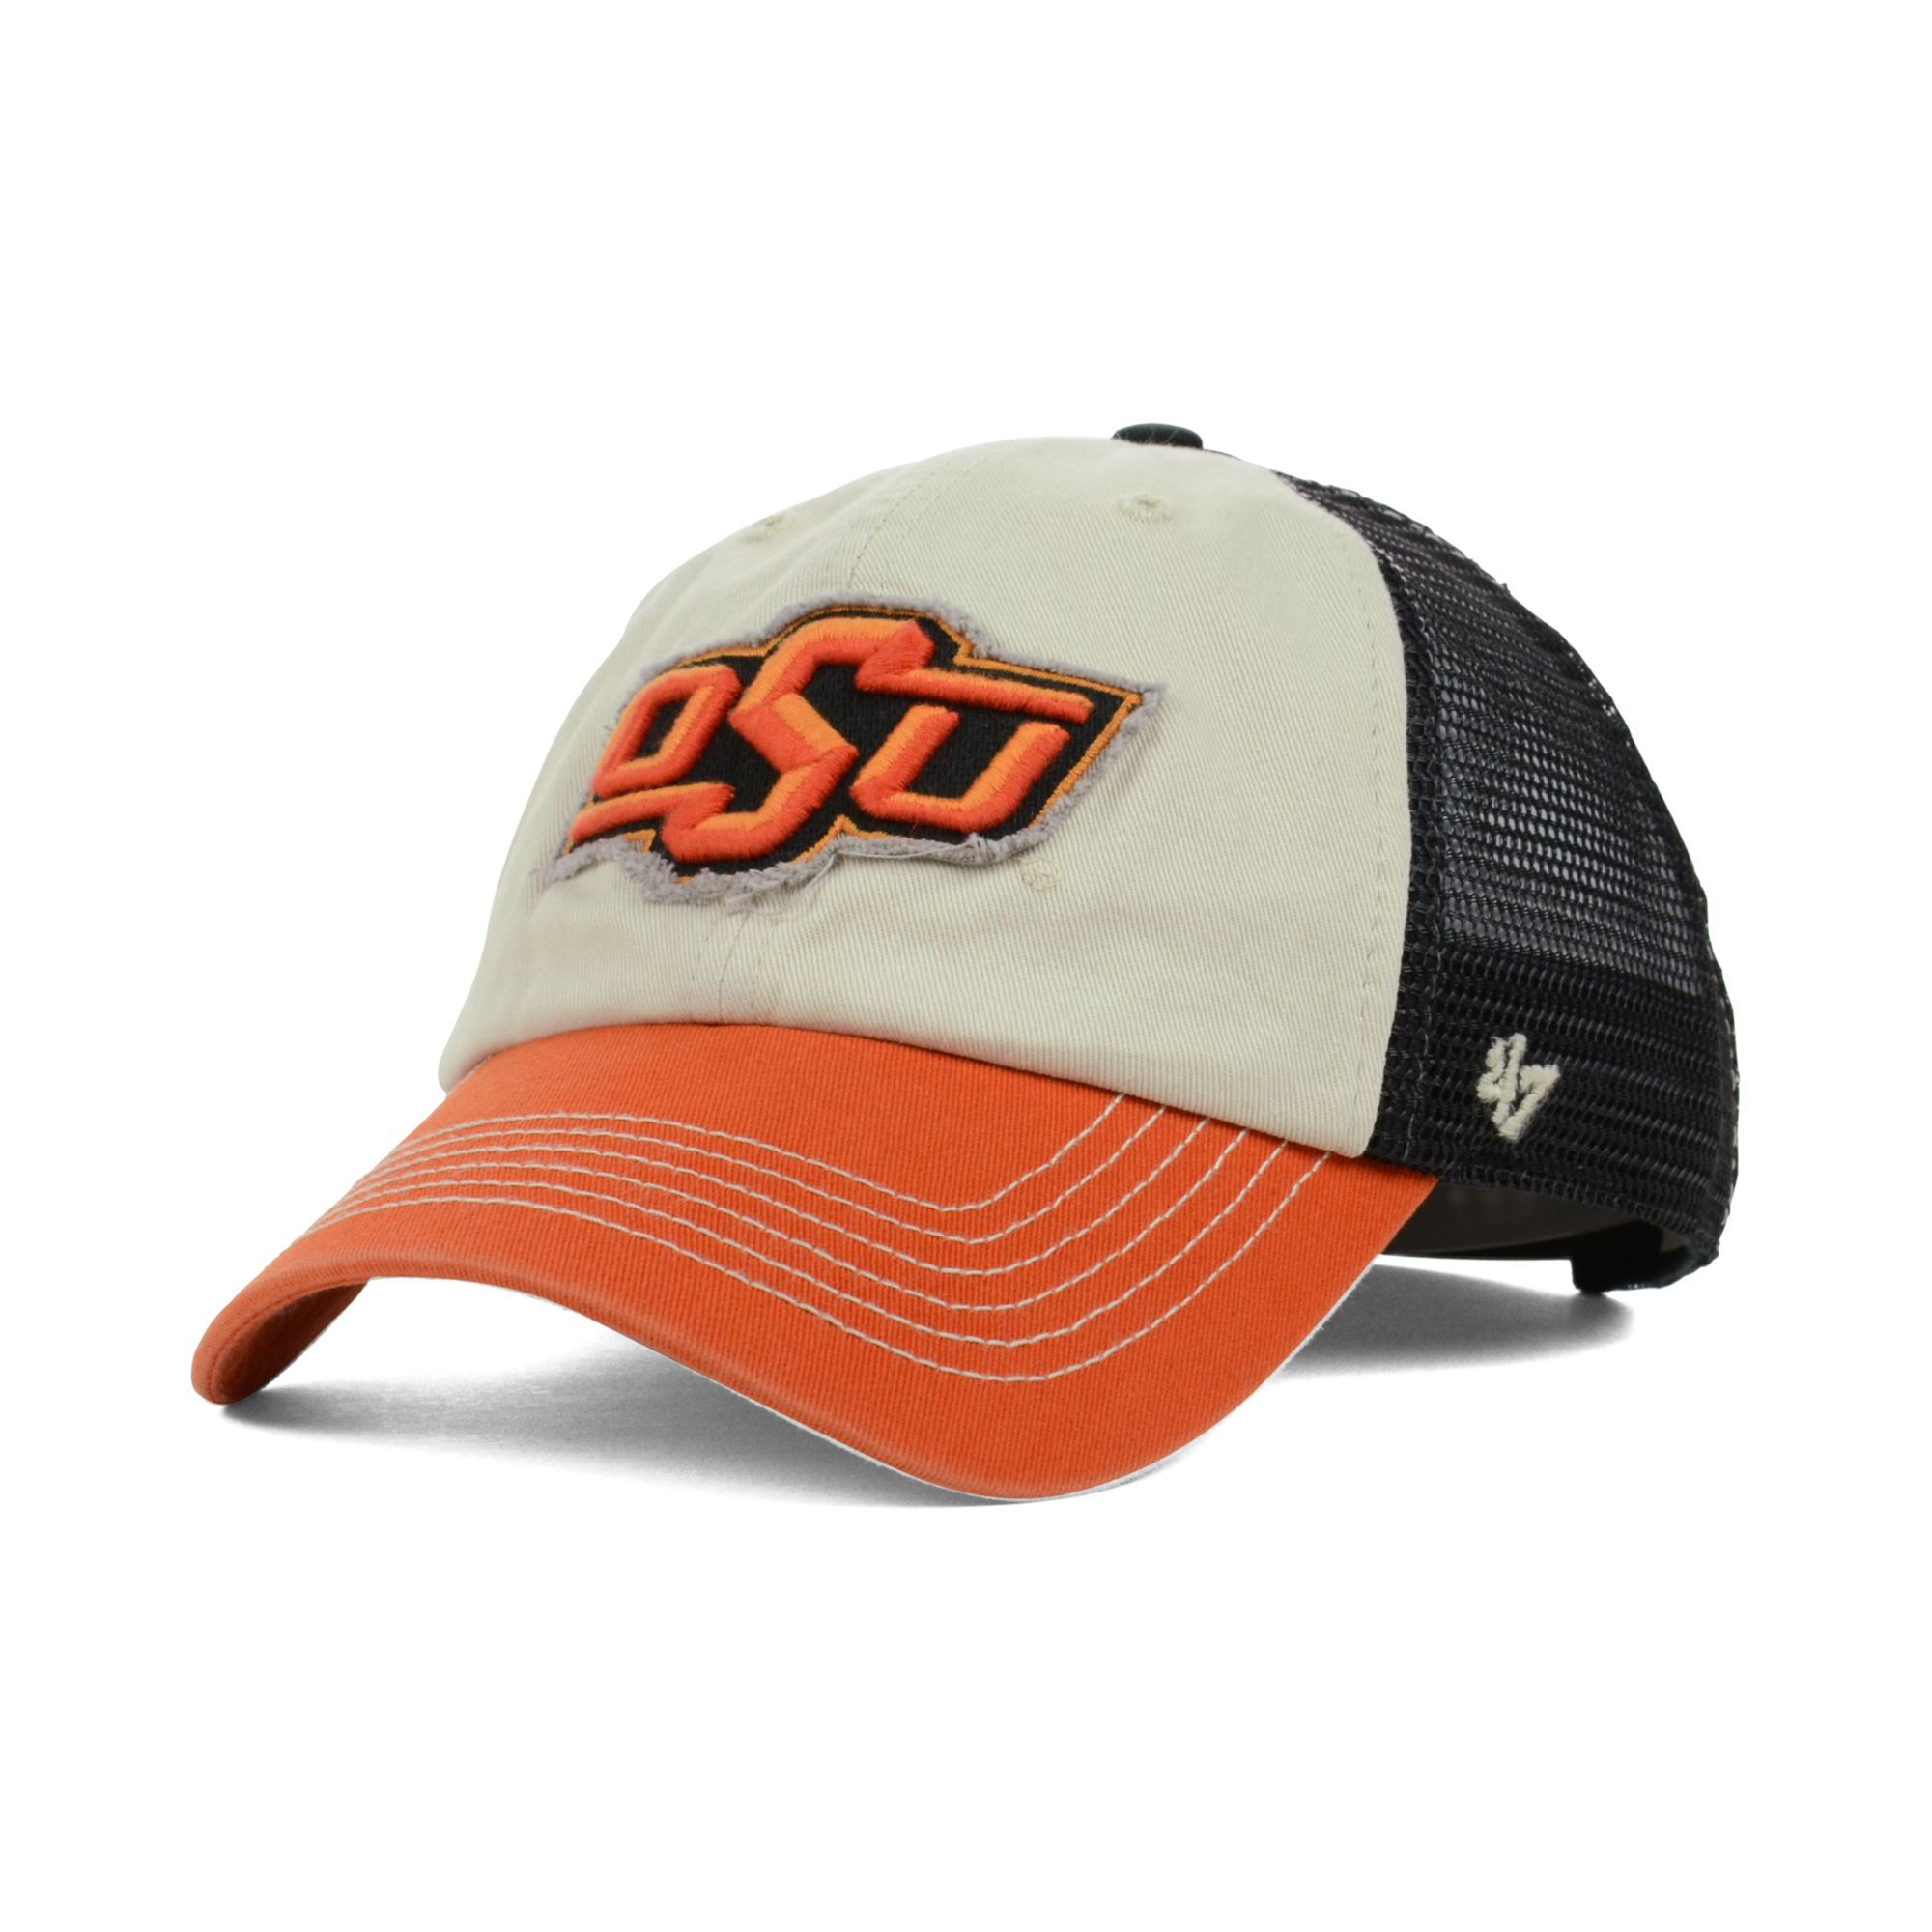 d4b16e58e5d ... clean up cap 20816776 4fe4a 8da76  cheapest lyst 47 brand oklahoma  state cowboys schist trucker cap in natural d508b 4d03d